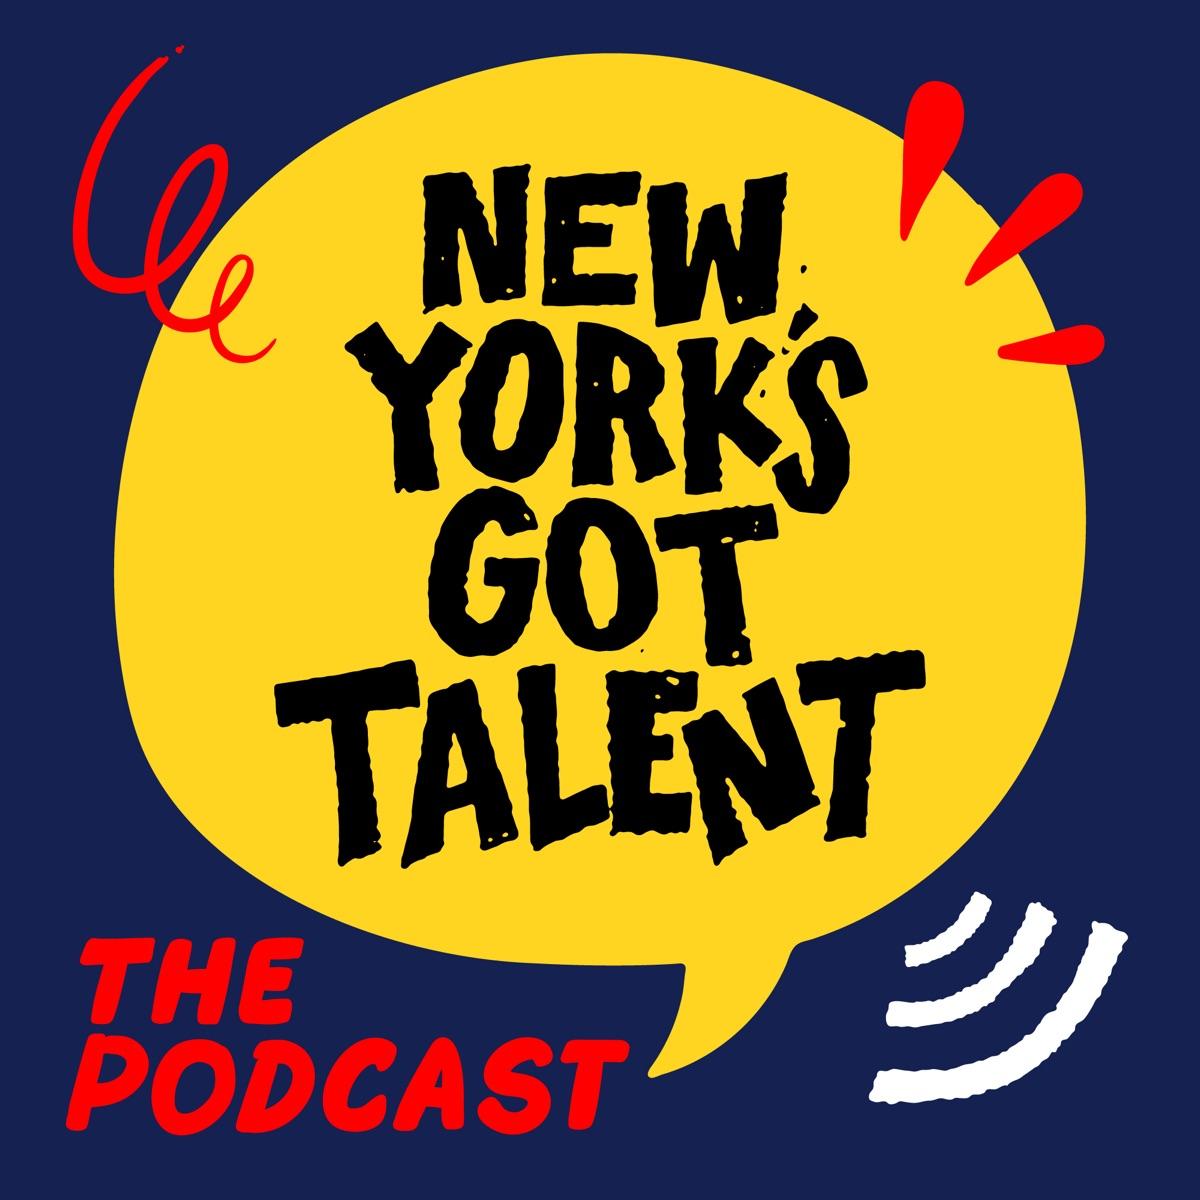 New York's Got Talent